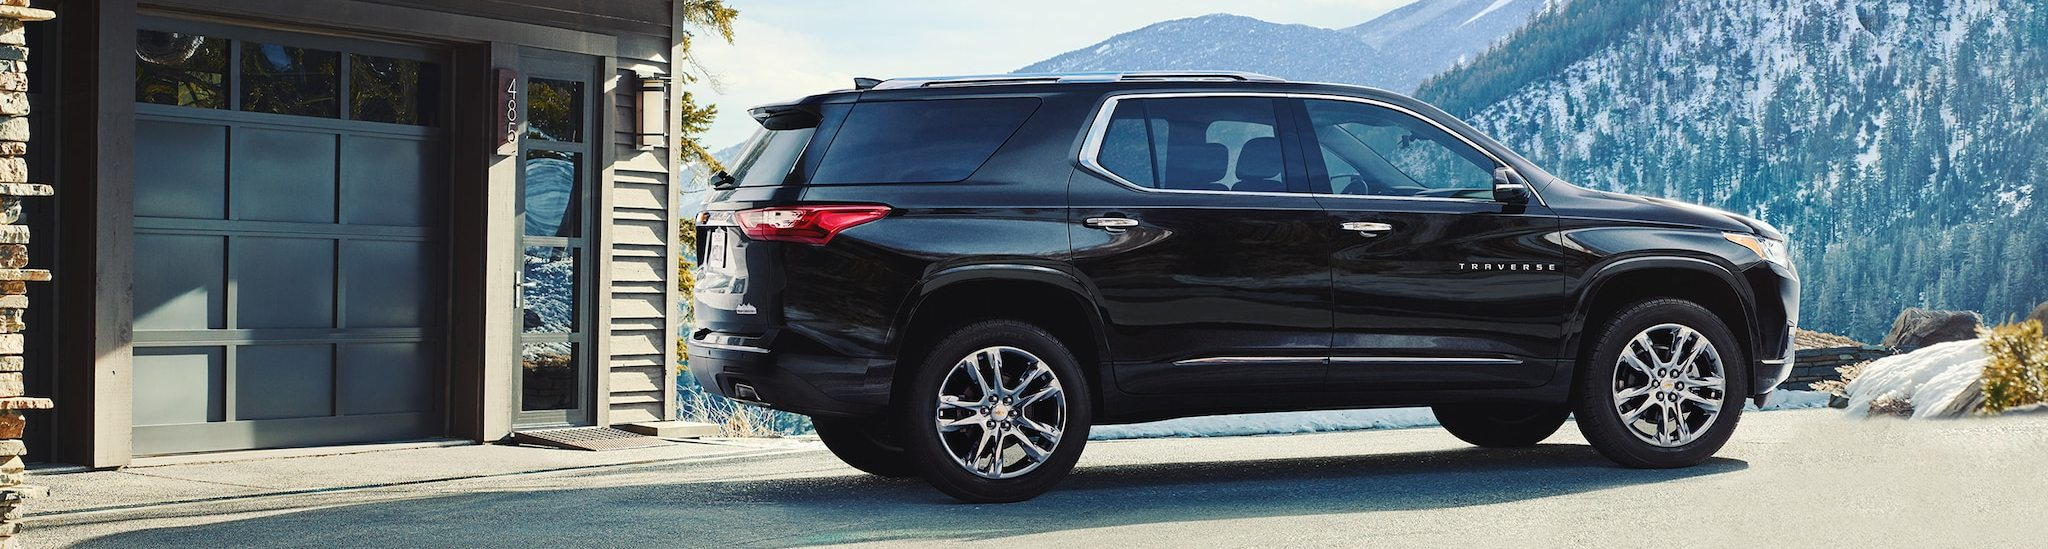 2020 Chevrolet Traverse for Sale in Davison, MI